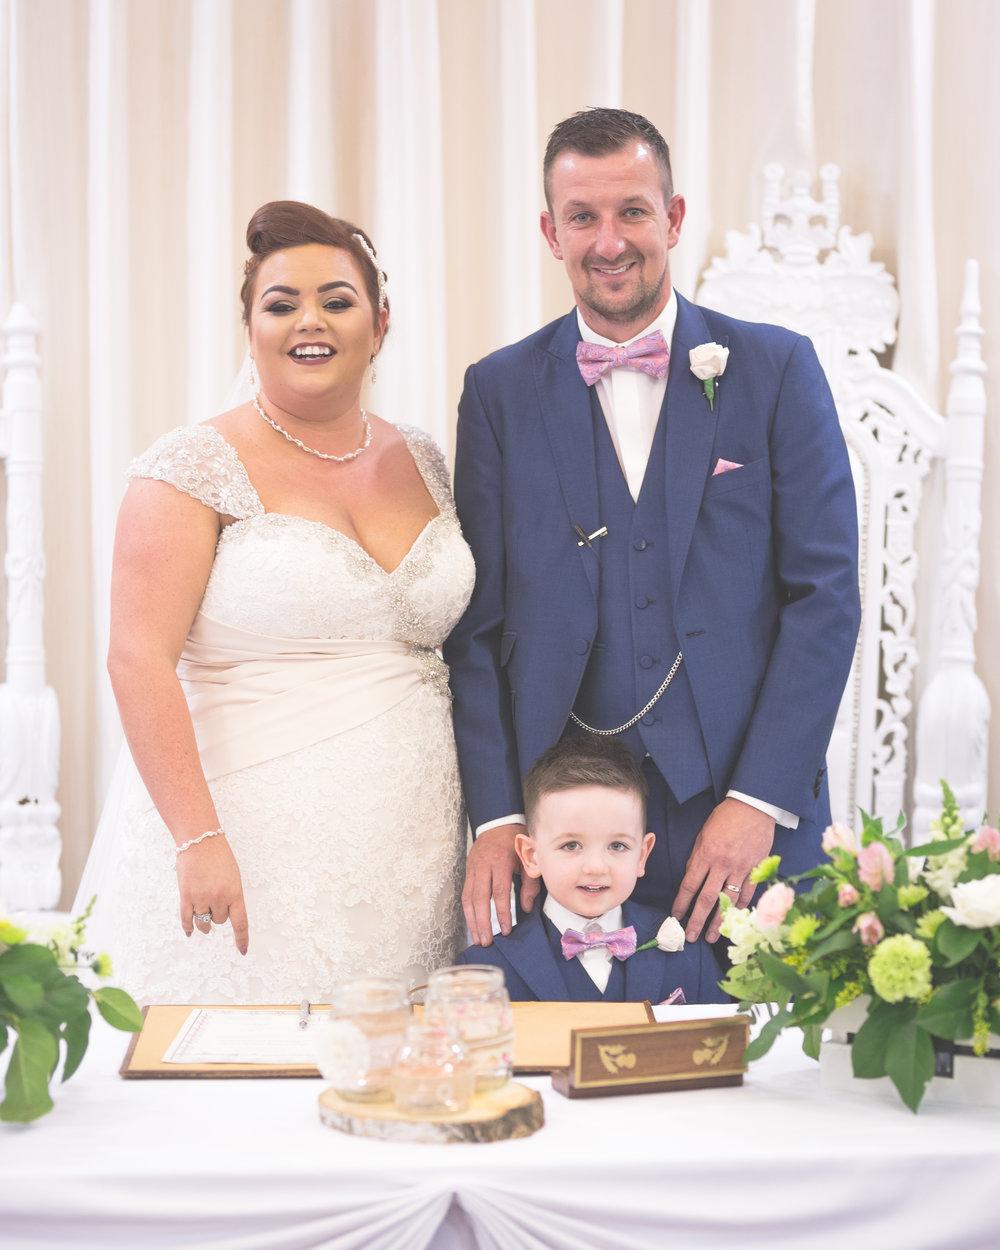 Antoinette & Stephen - Ceremony | Brian McEwan Photography | Wedding Photographer Northern Ireland 112.jpg